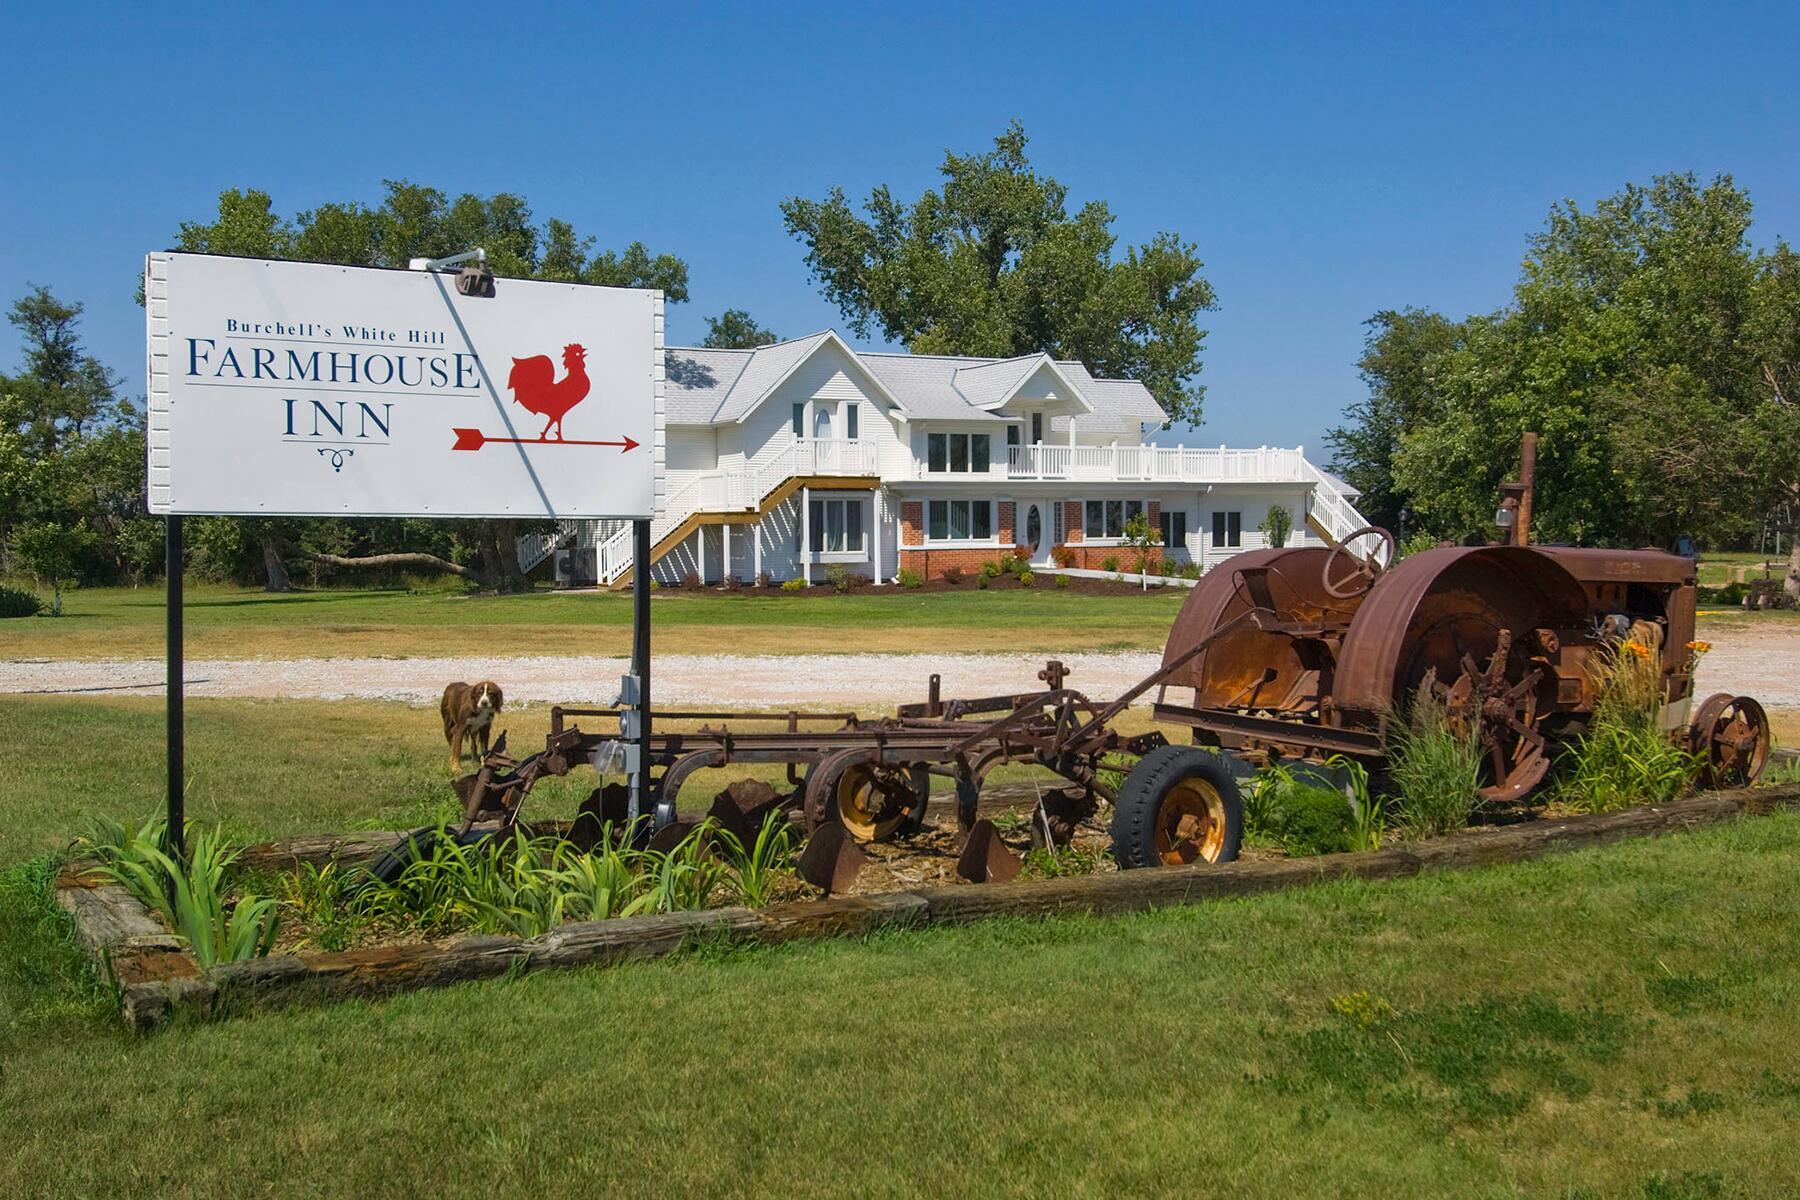 Burchells White Hill Farmhouse Inn - Nebraska bed and breakfasts face unprecedented challenges